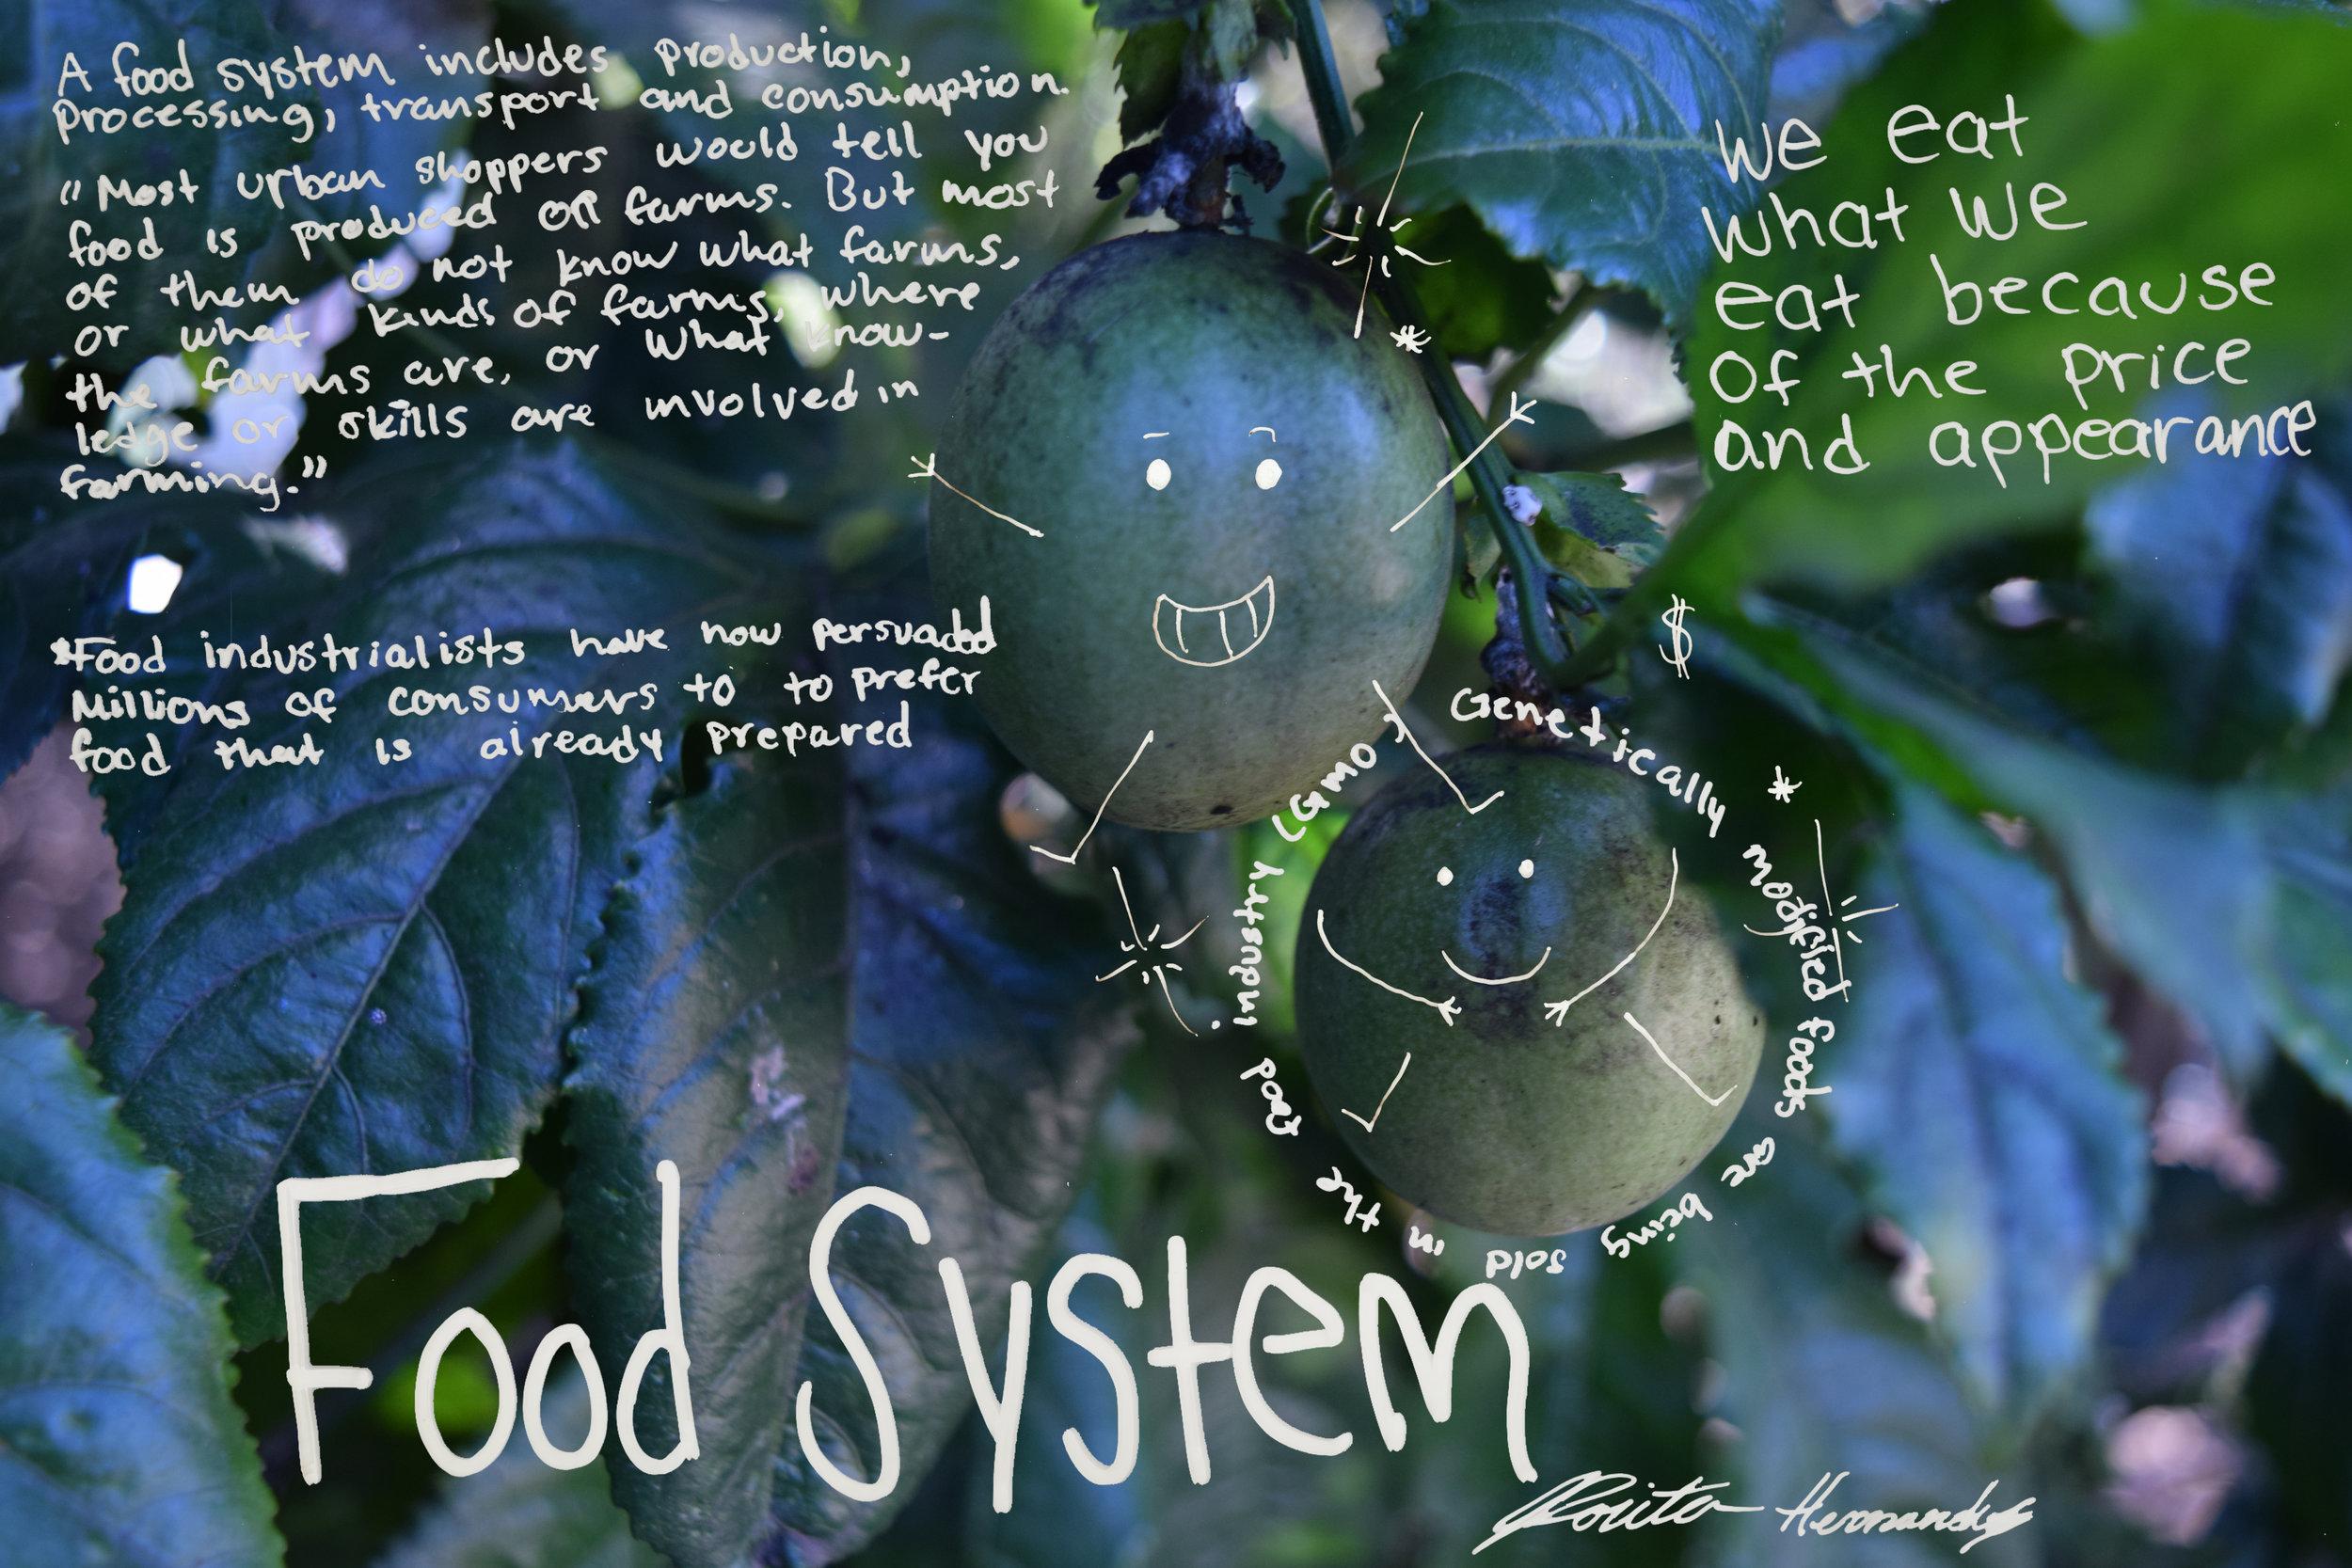 170301_SnapShot_Sp17_foodjustice_Rosita.jpg